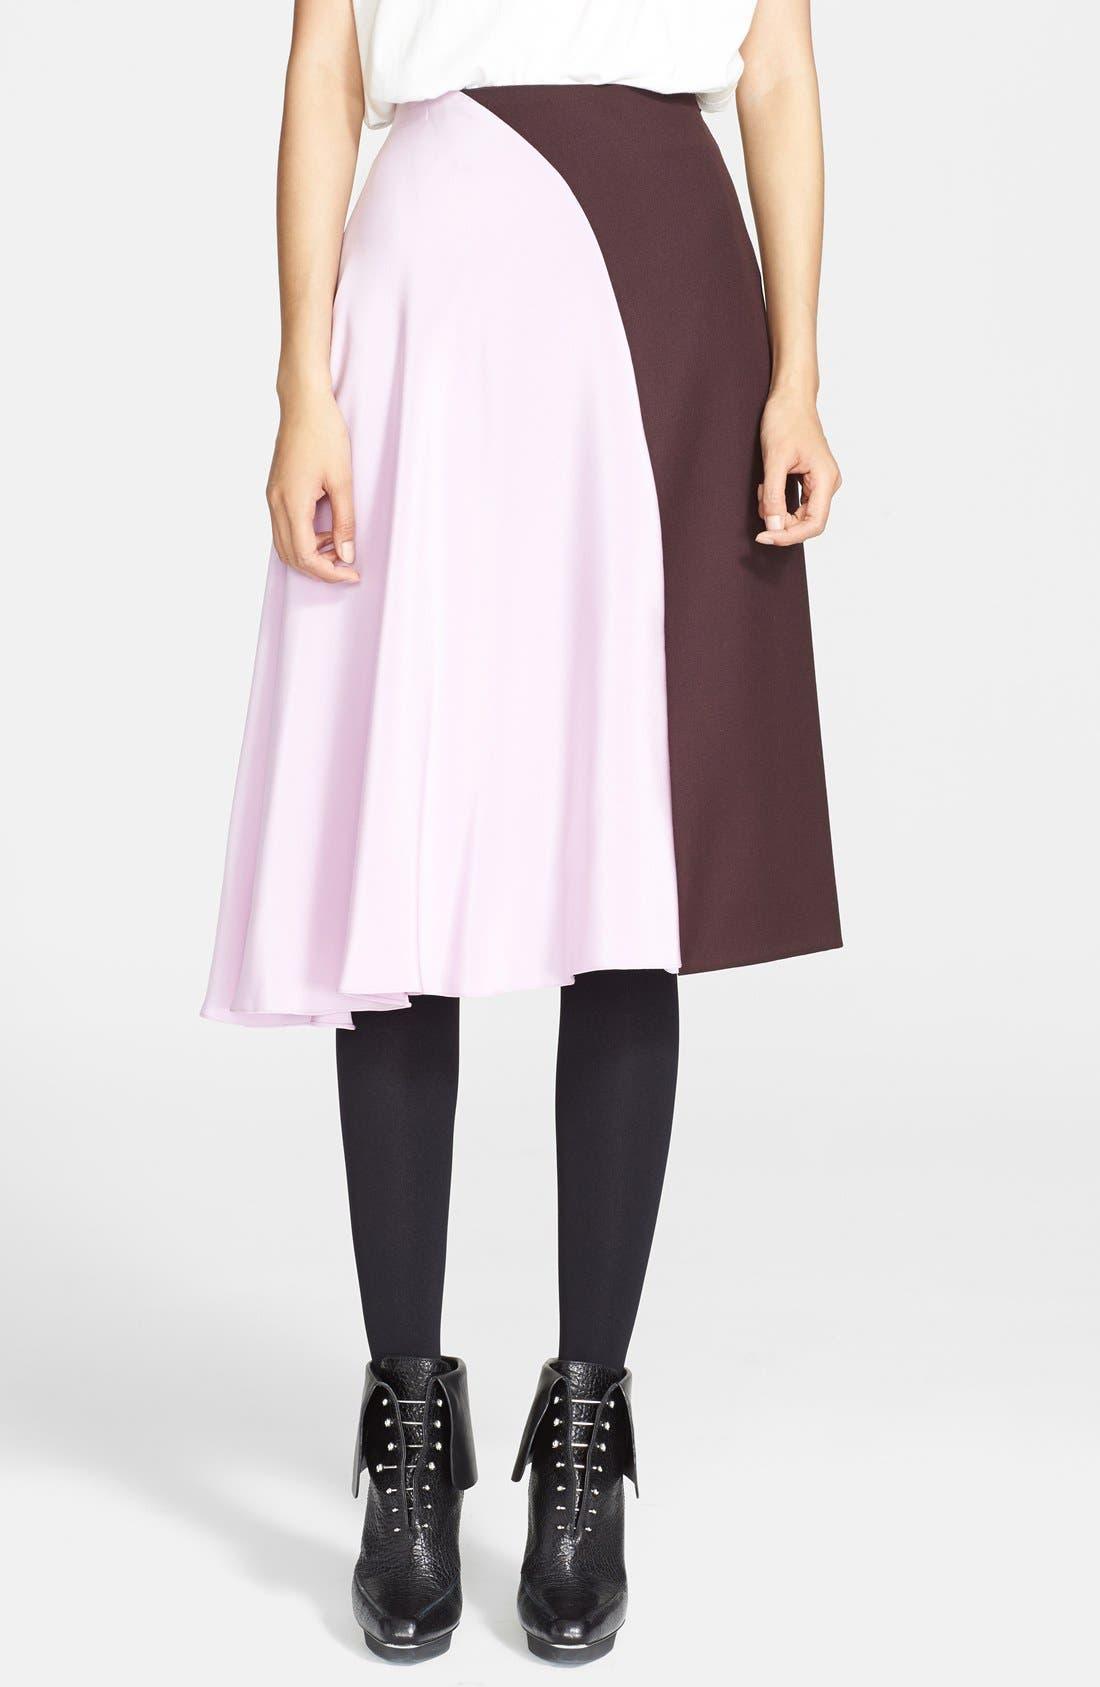 Alternate Image 1 Selected - 3.1 Phillip Lim 'Horizon' Wool & Crêpe de Chine Skirt